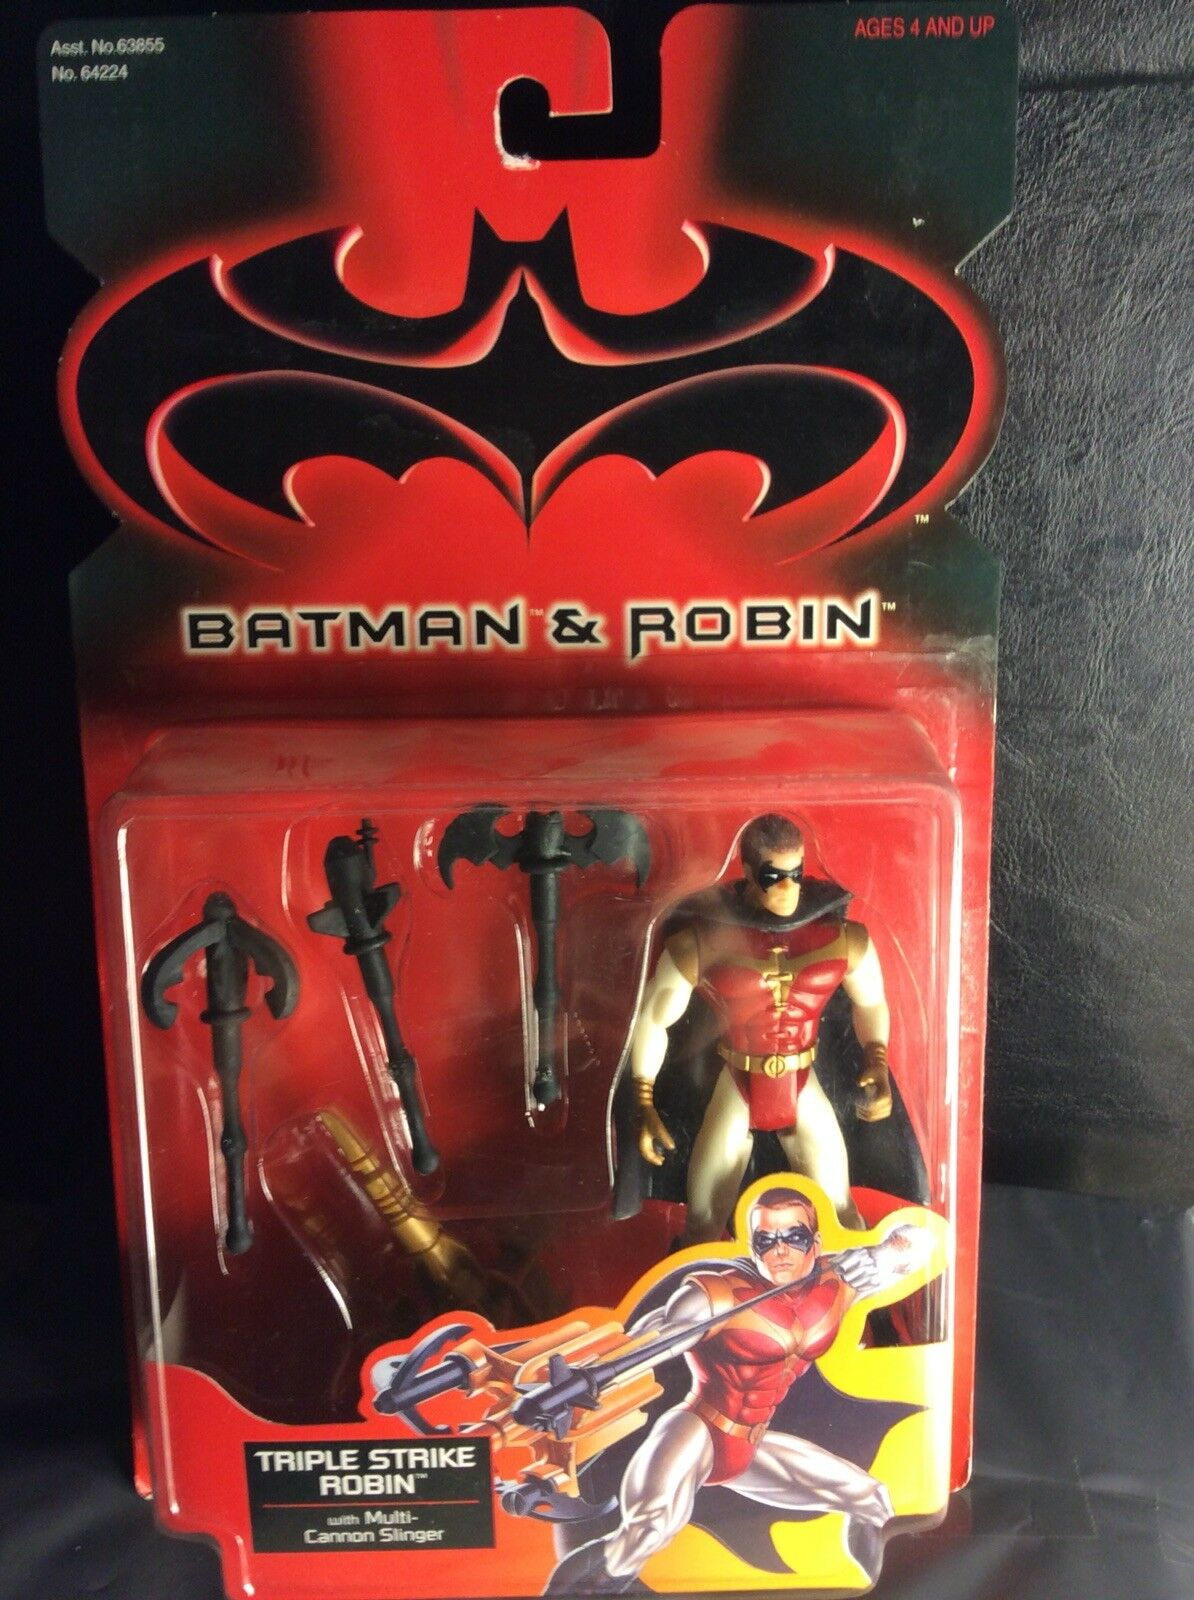 1997 1997 1997 Kenner Batman And Robin Triple Strike Robin bf1fcc